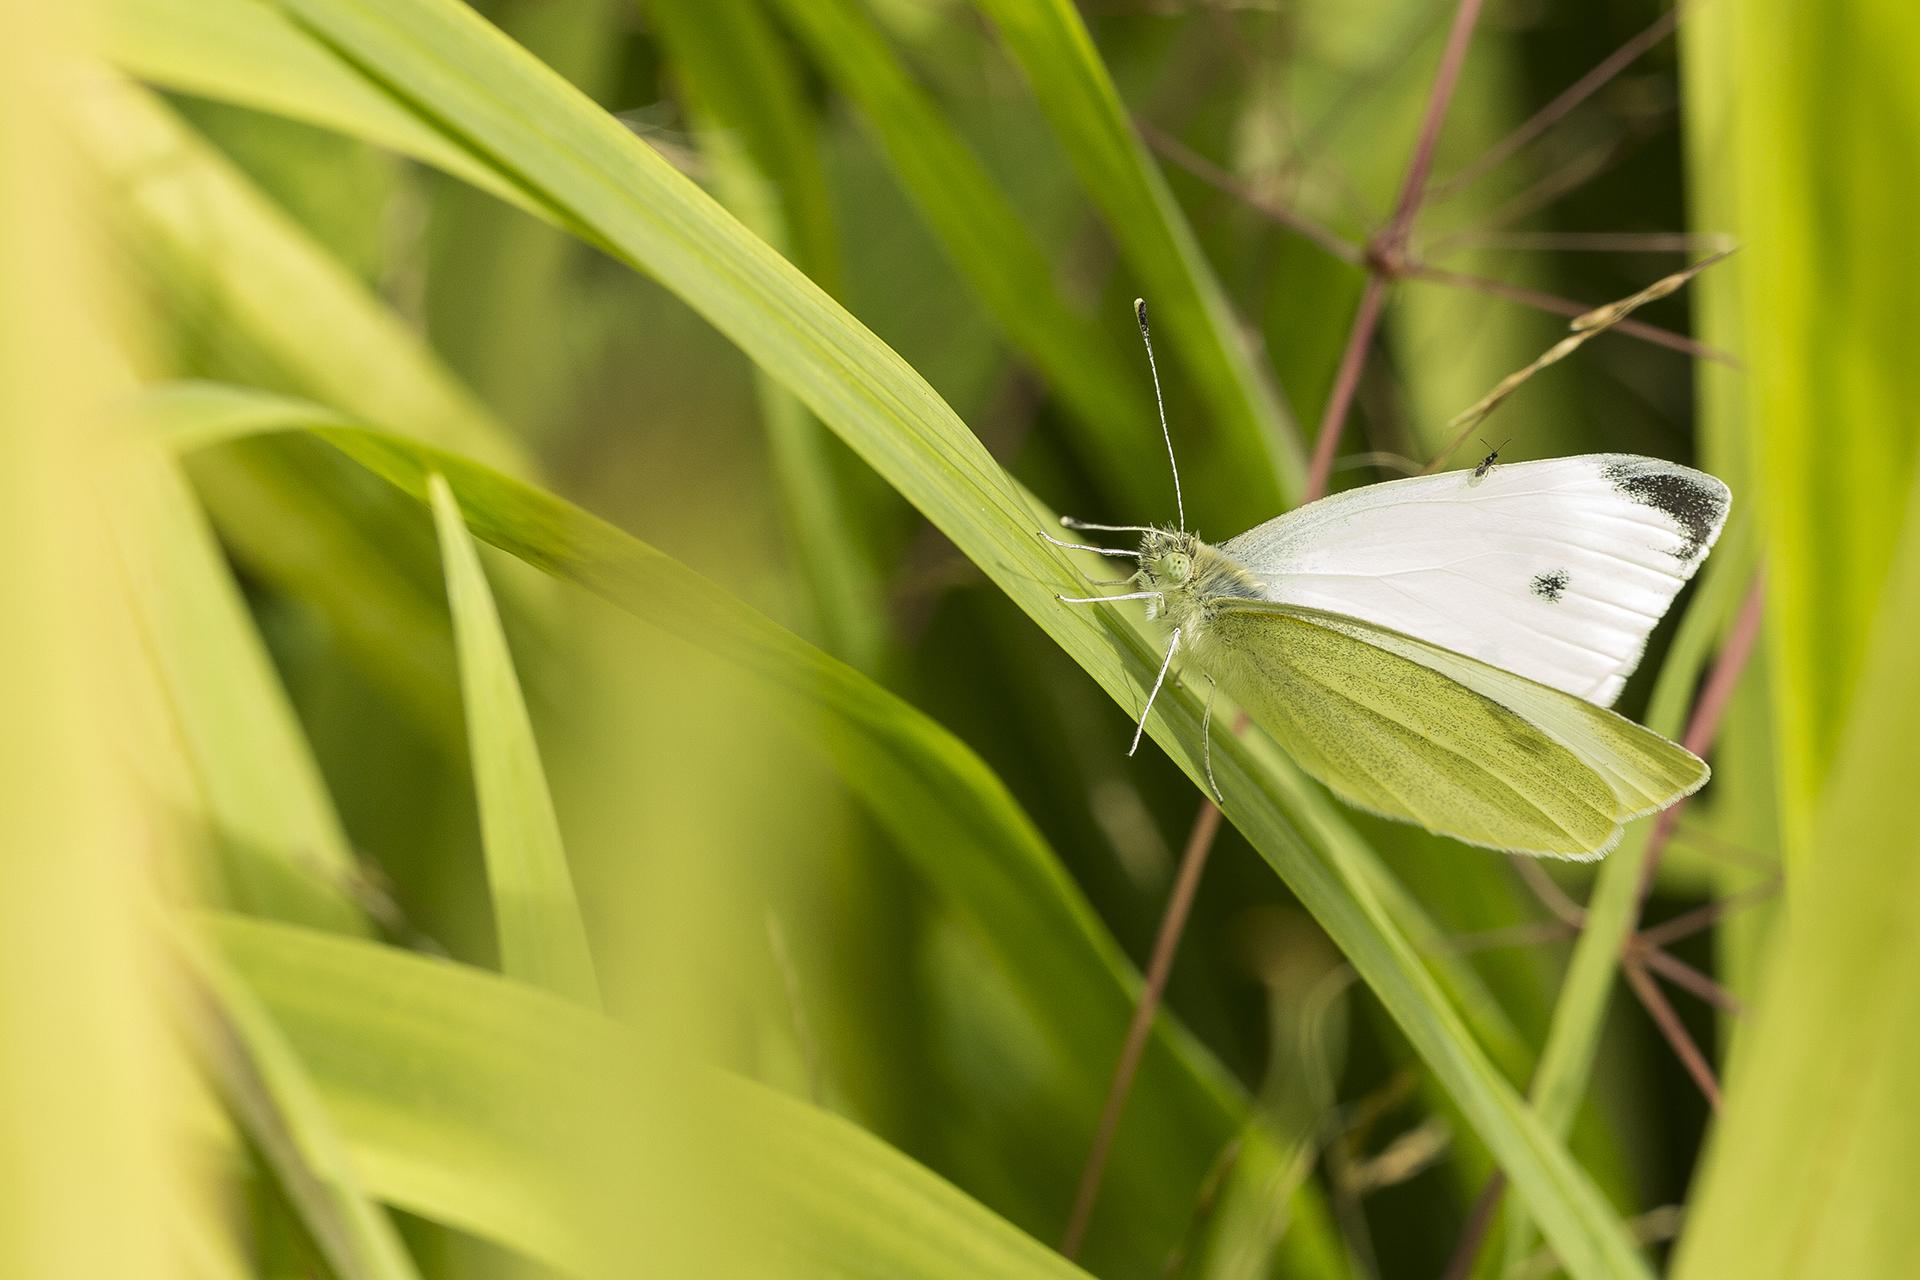 White butterfly in The Ridgeline Trust garden, Reading